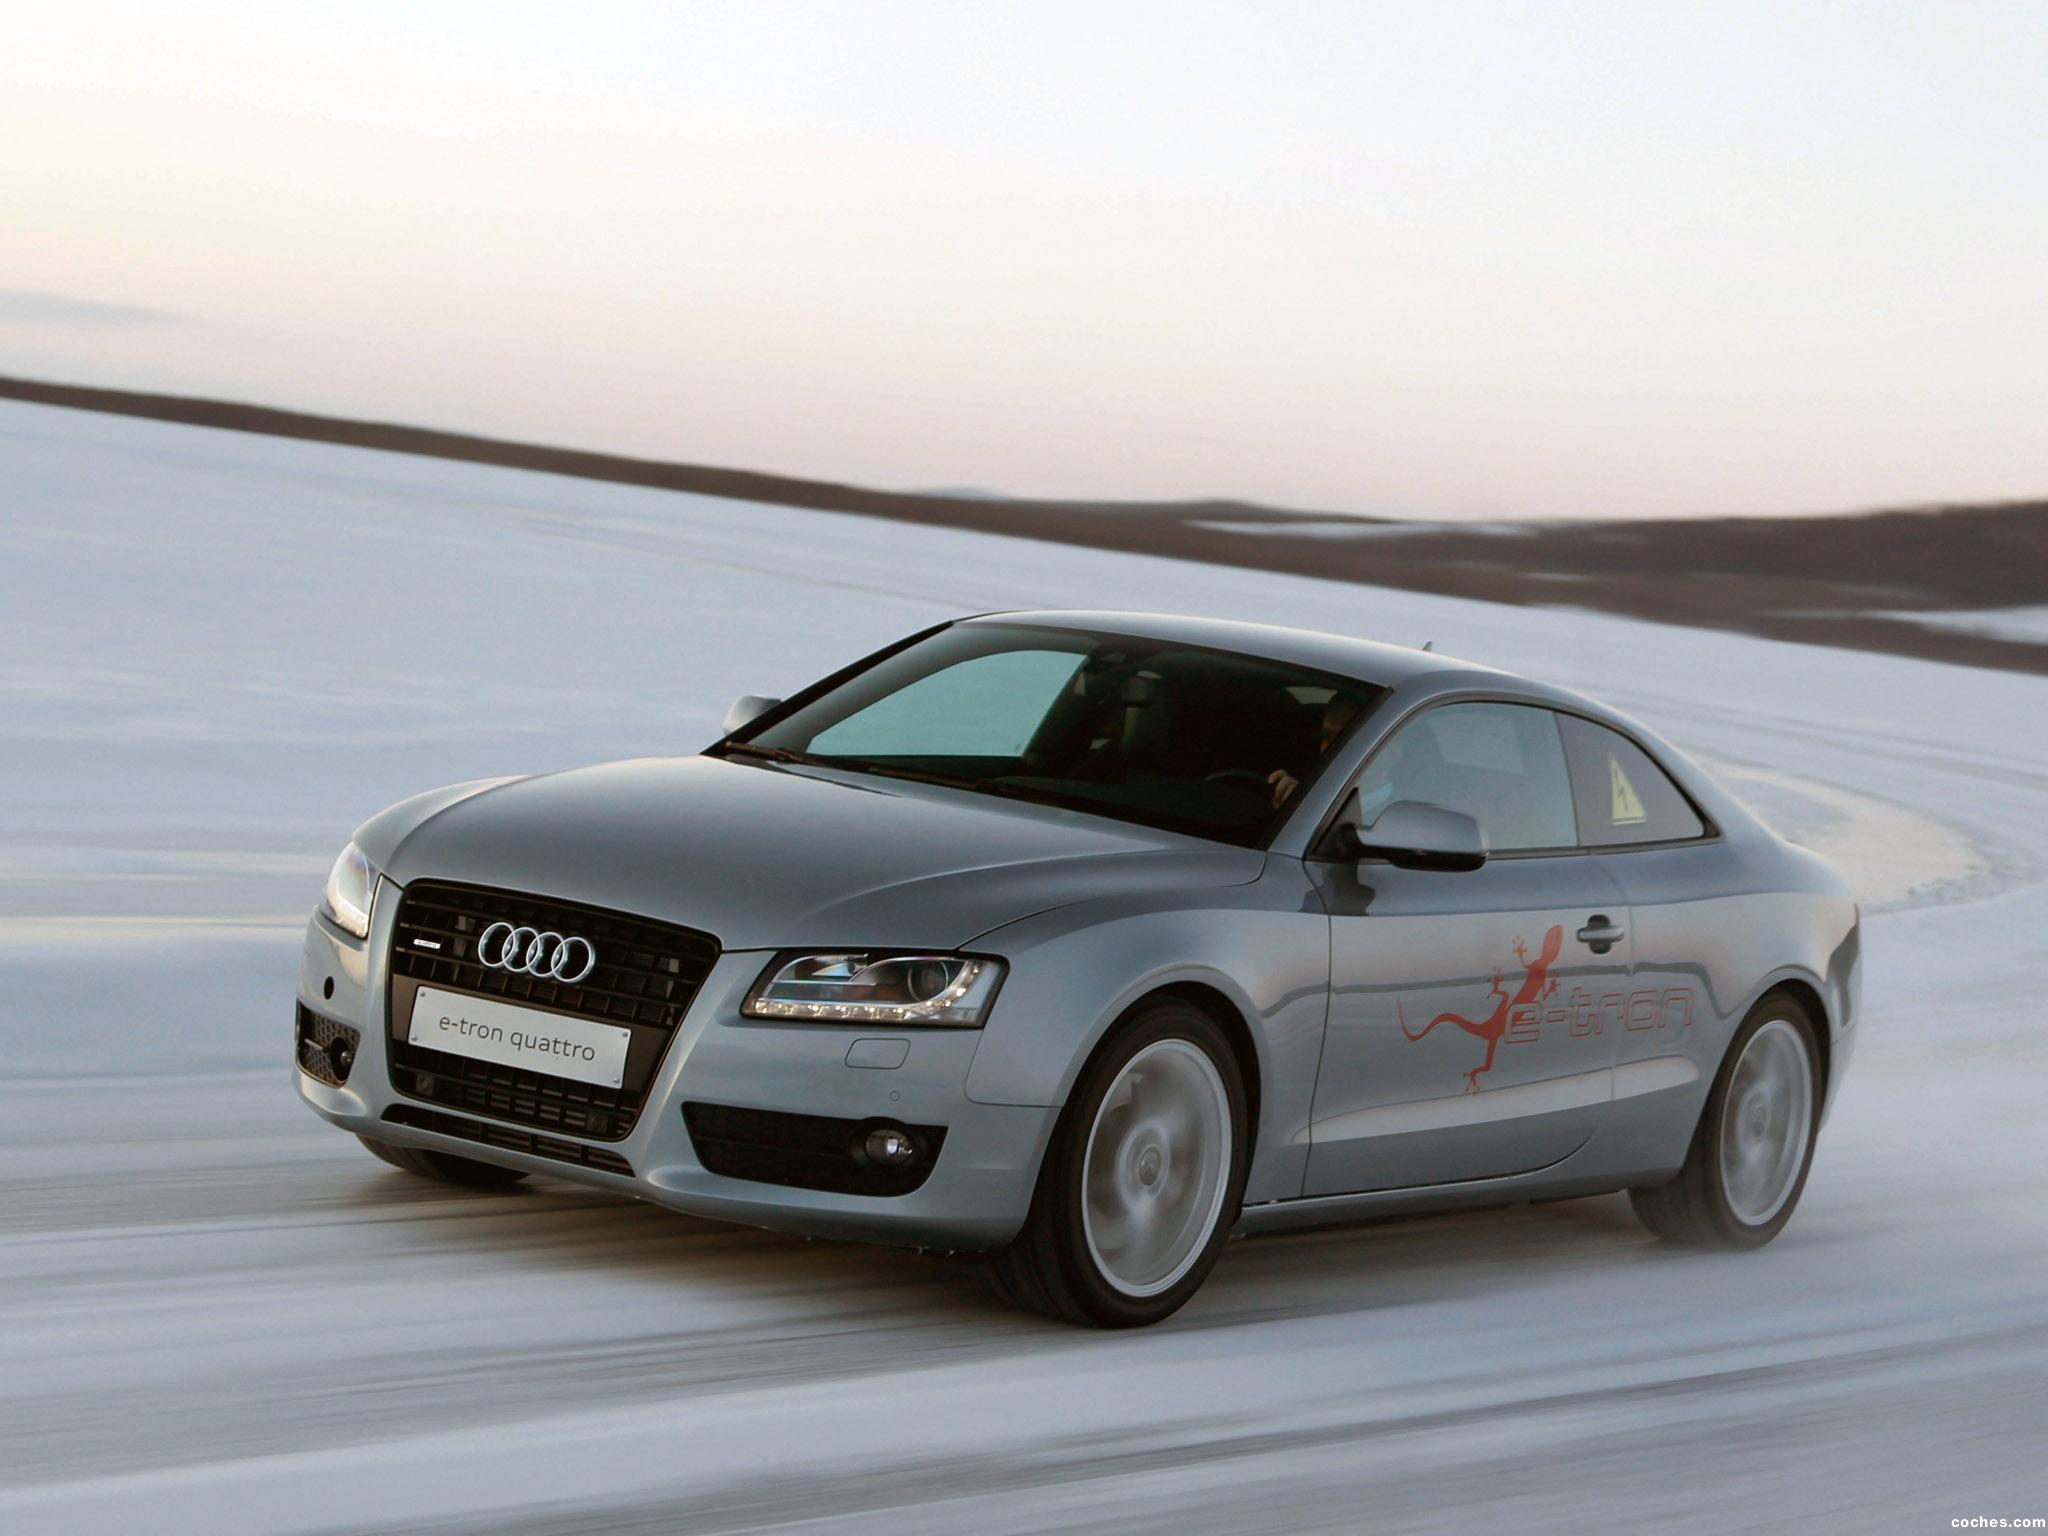 Foto 7 de Audi A5 e-tron Quattro Coupe 2011